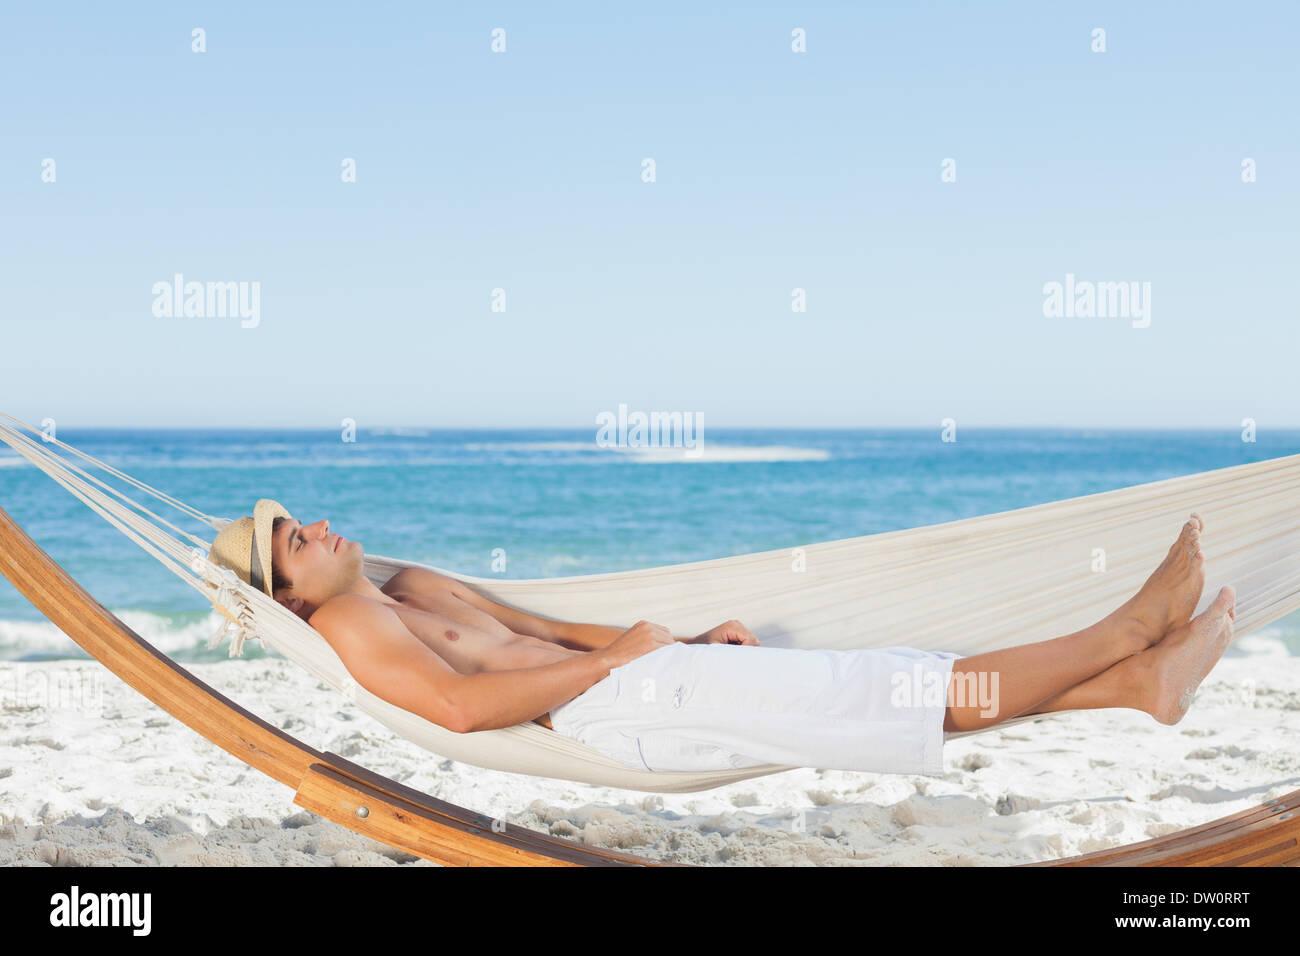 Senior Man Relaxing In Hammock Stock Image Man Relaxing